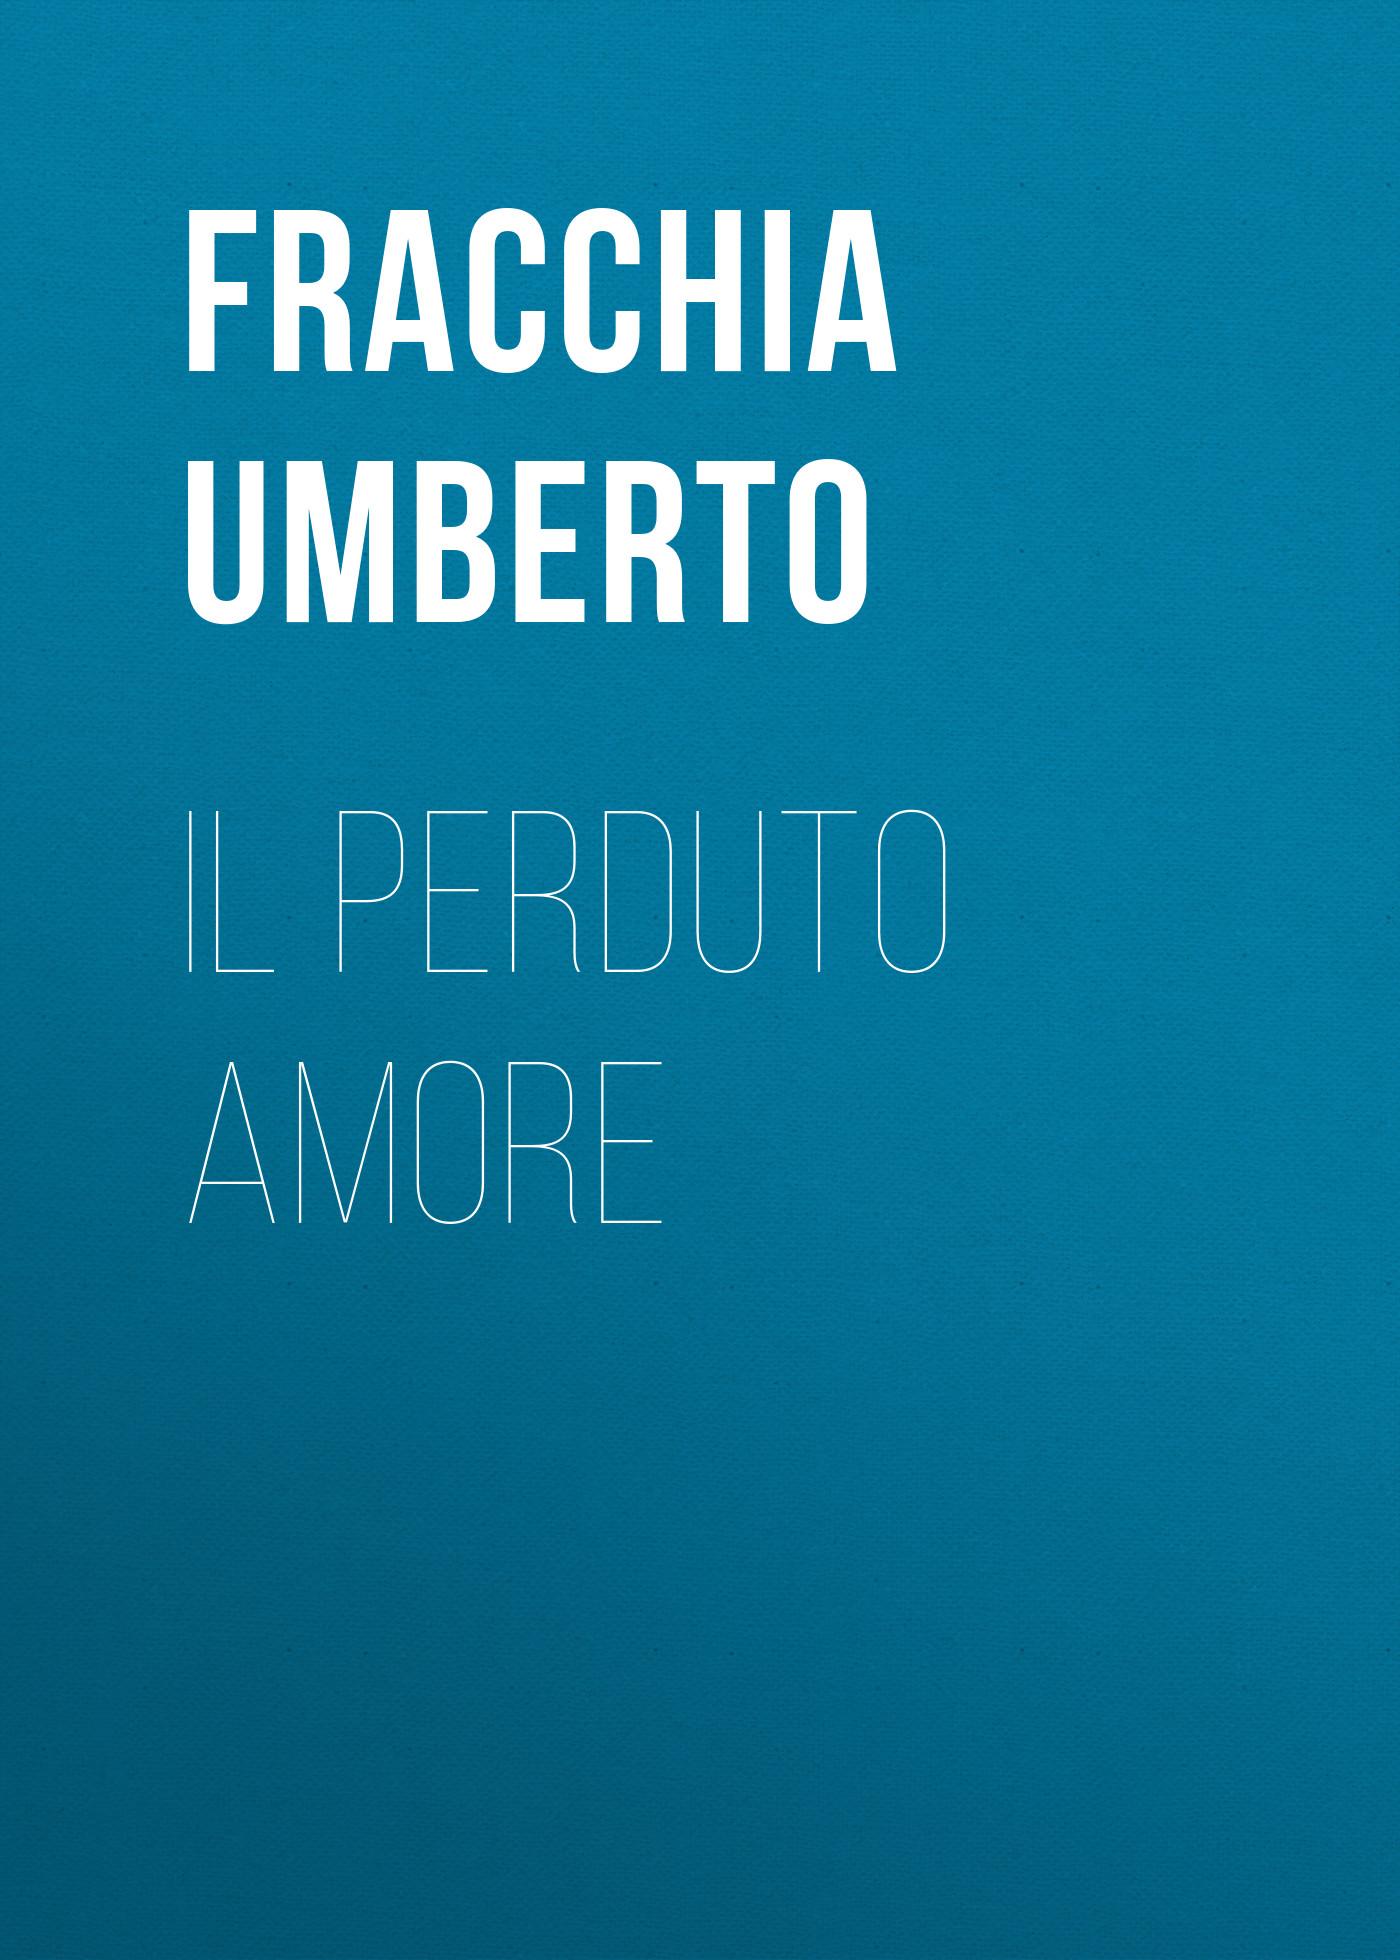 Fracchia Umberto Il perduto amore кофейный столик umberto